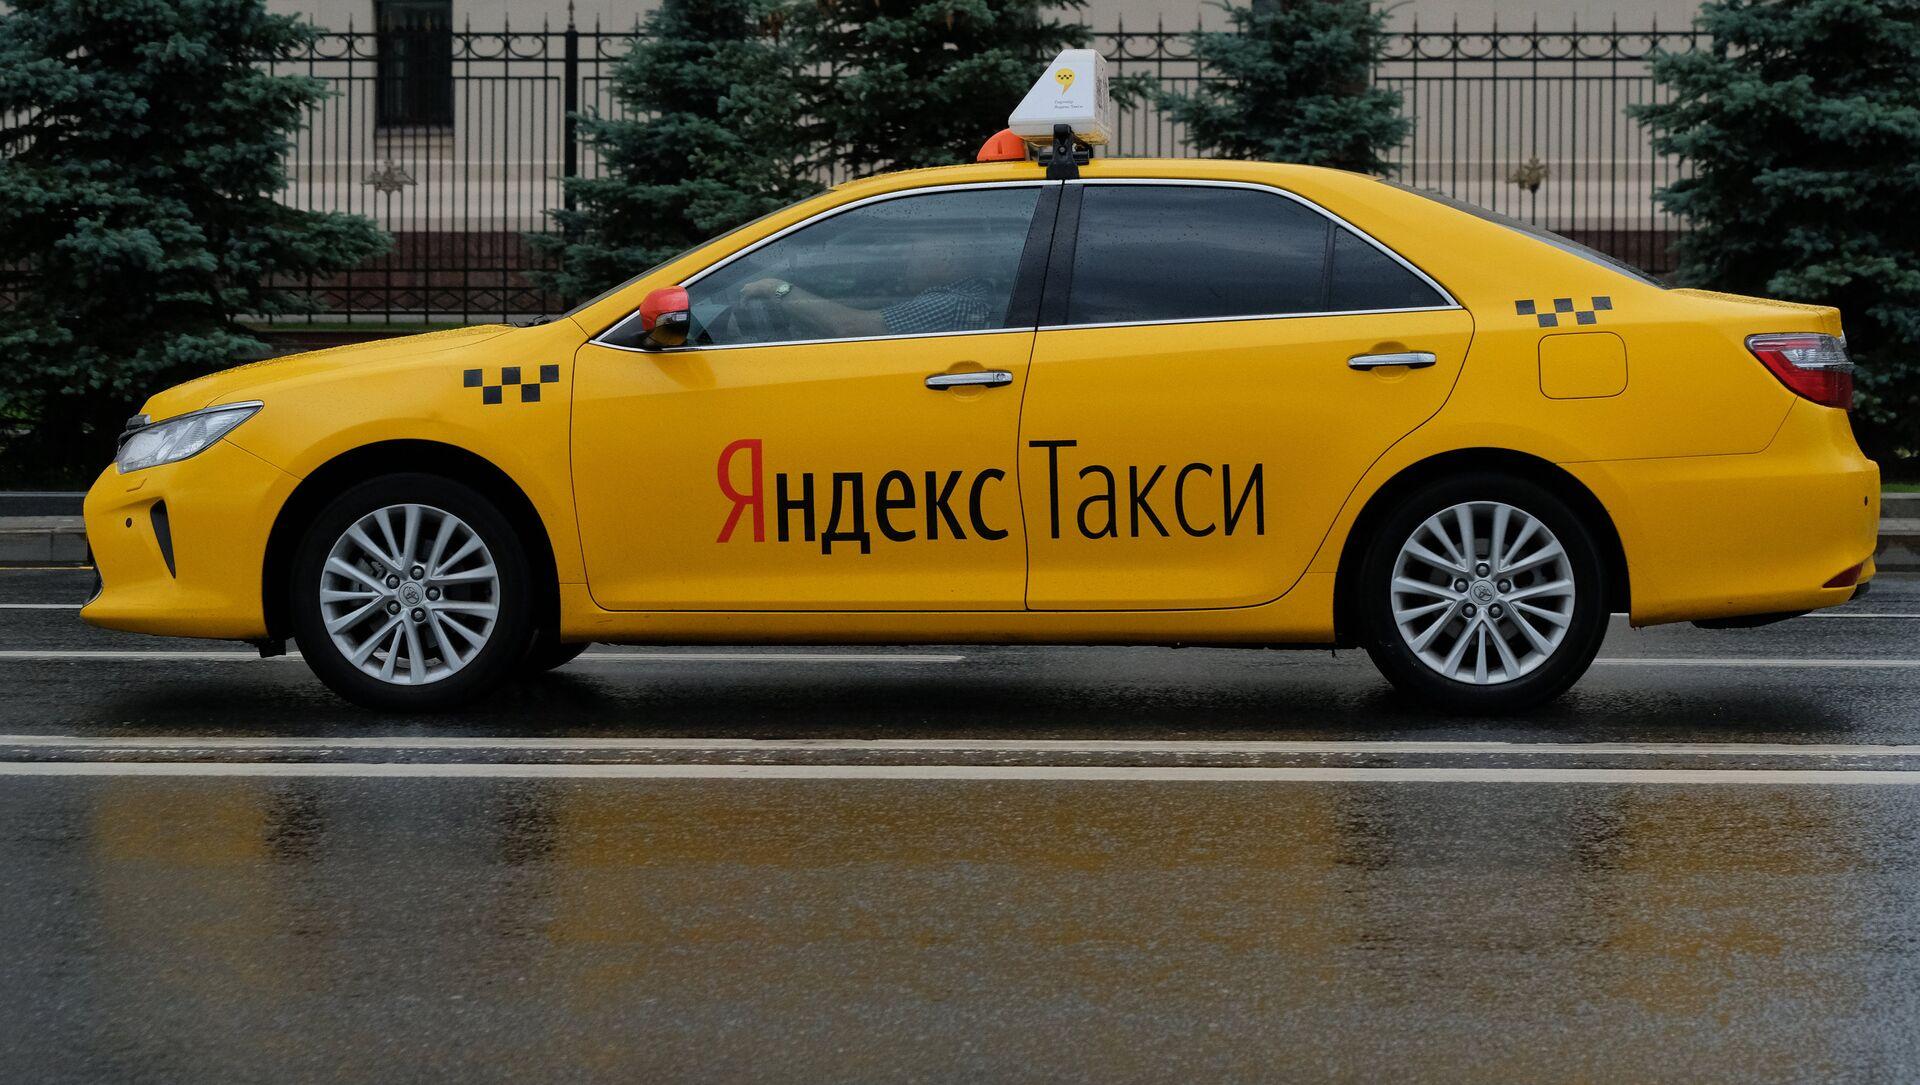 Yandex Taxi  - Sputnik Việt Nam, 1920, 09.09.2021